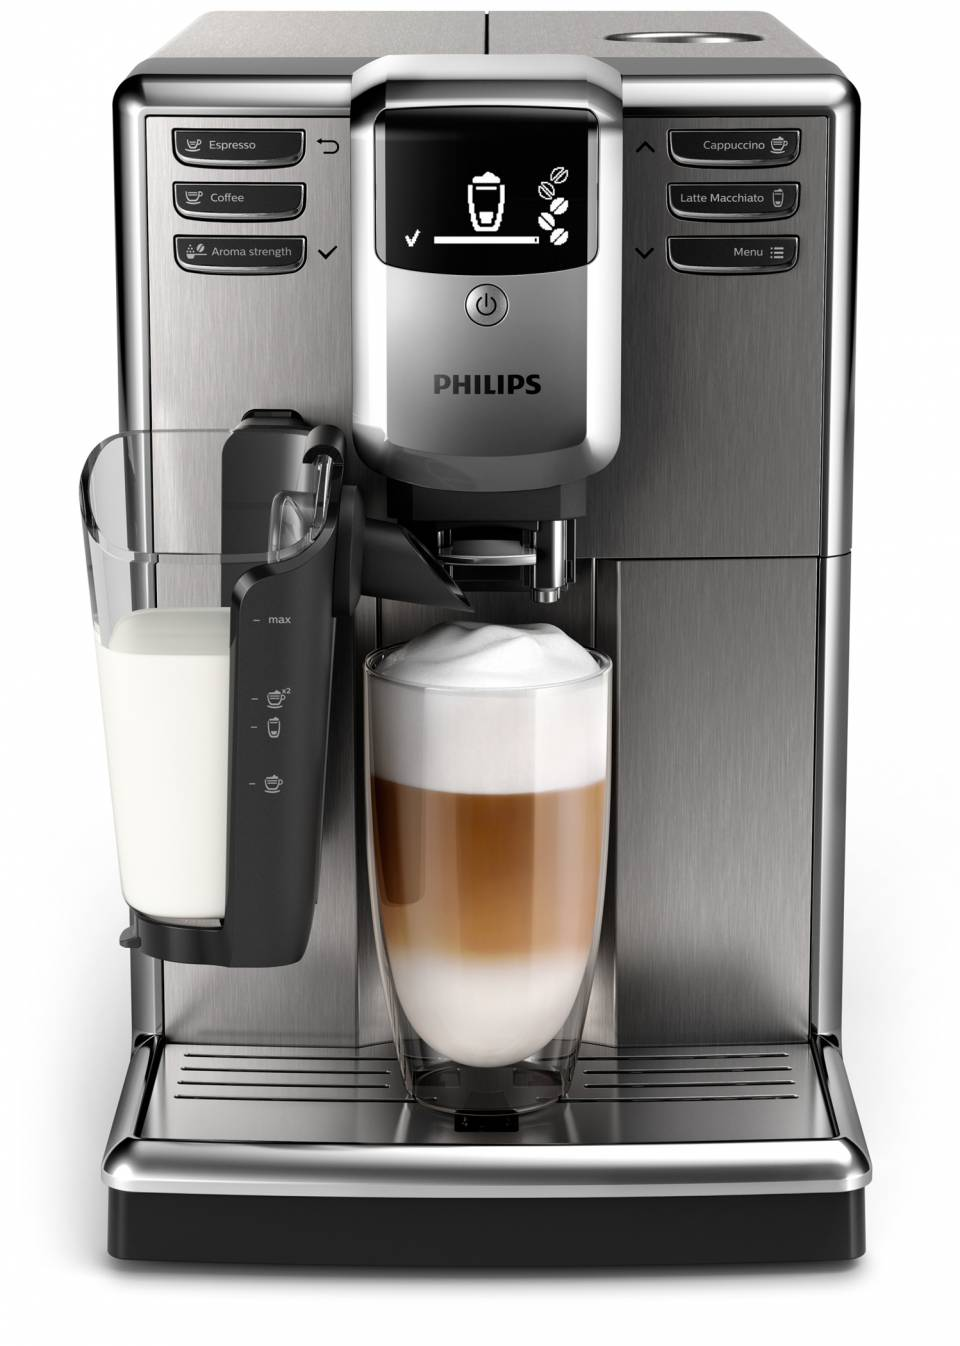 Philips Kaffeevollautomat 5000 LatteGo EP533510 mit LatteGo Milchsystem.